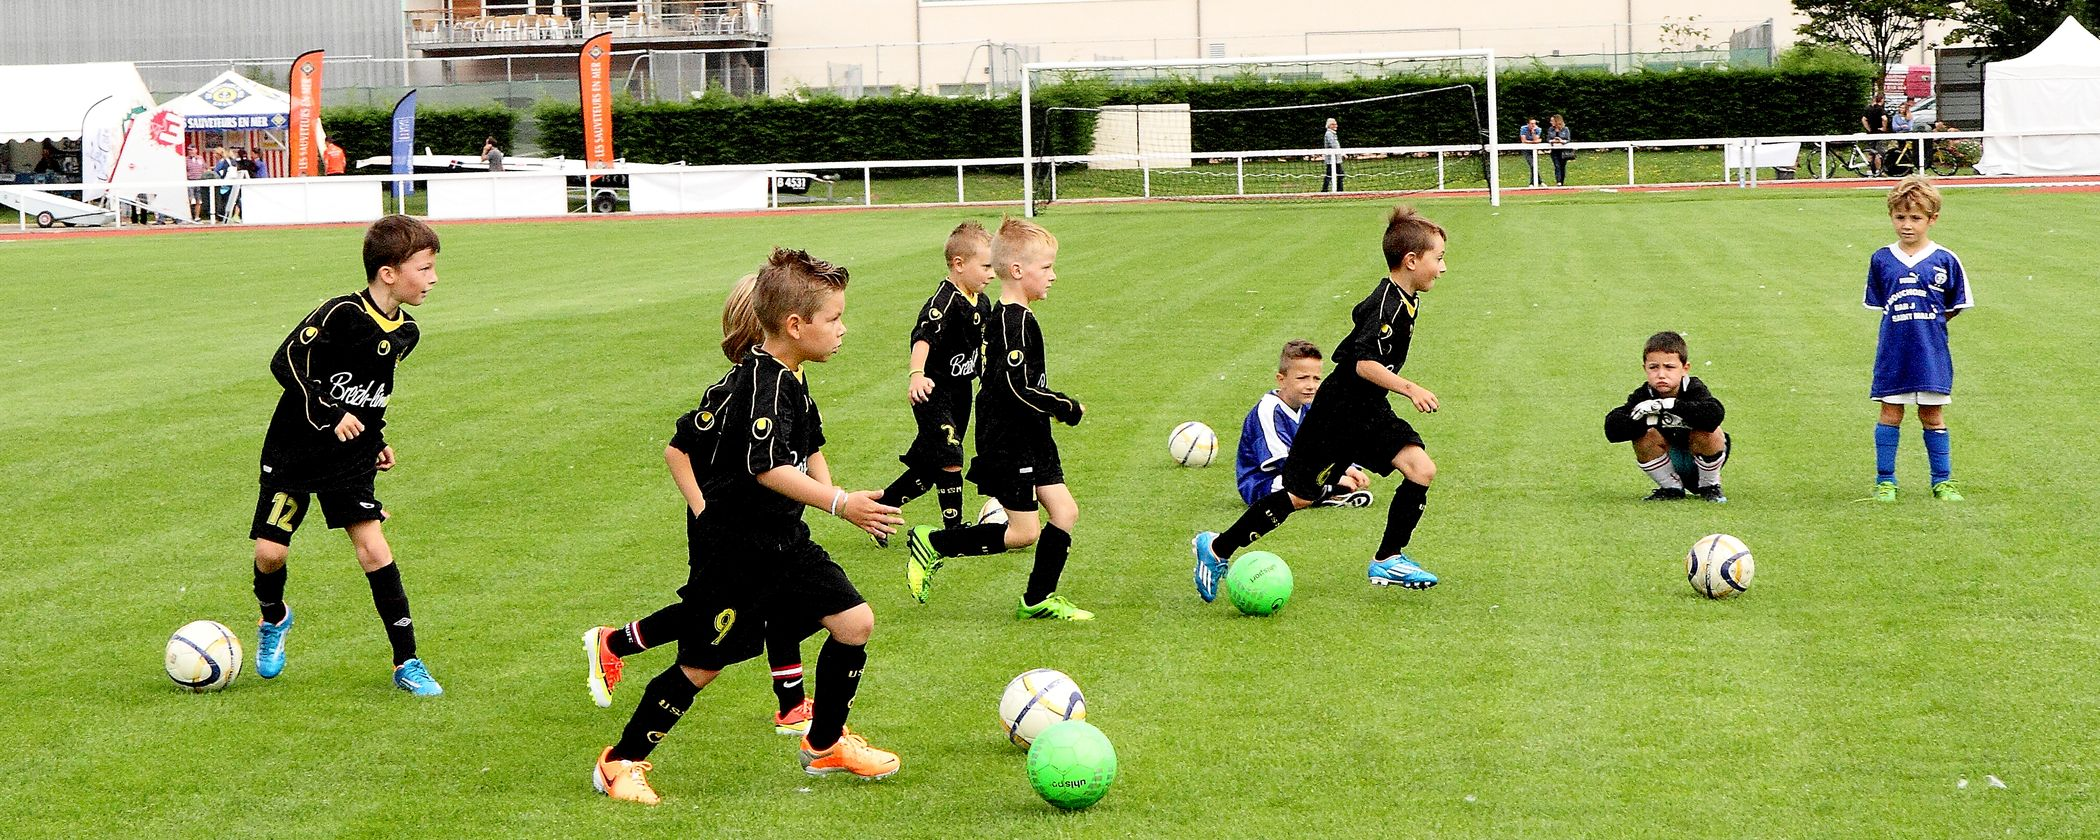 Animation football Saint-Malo Village des associations